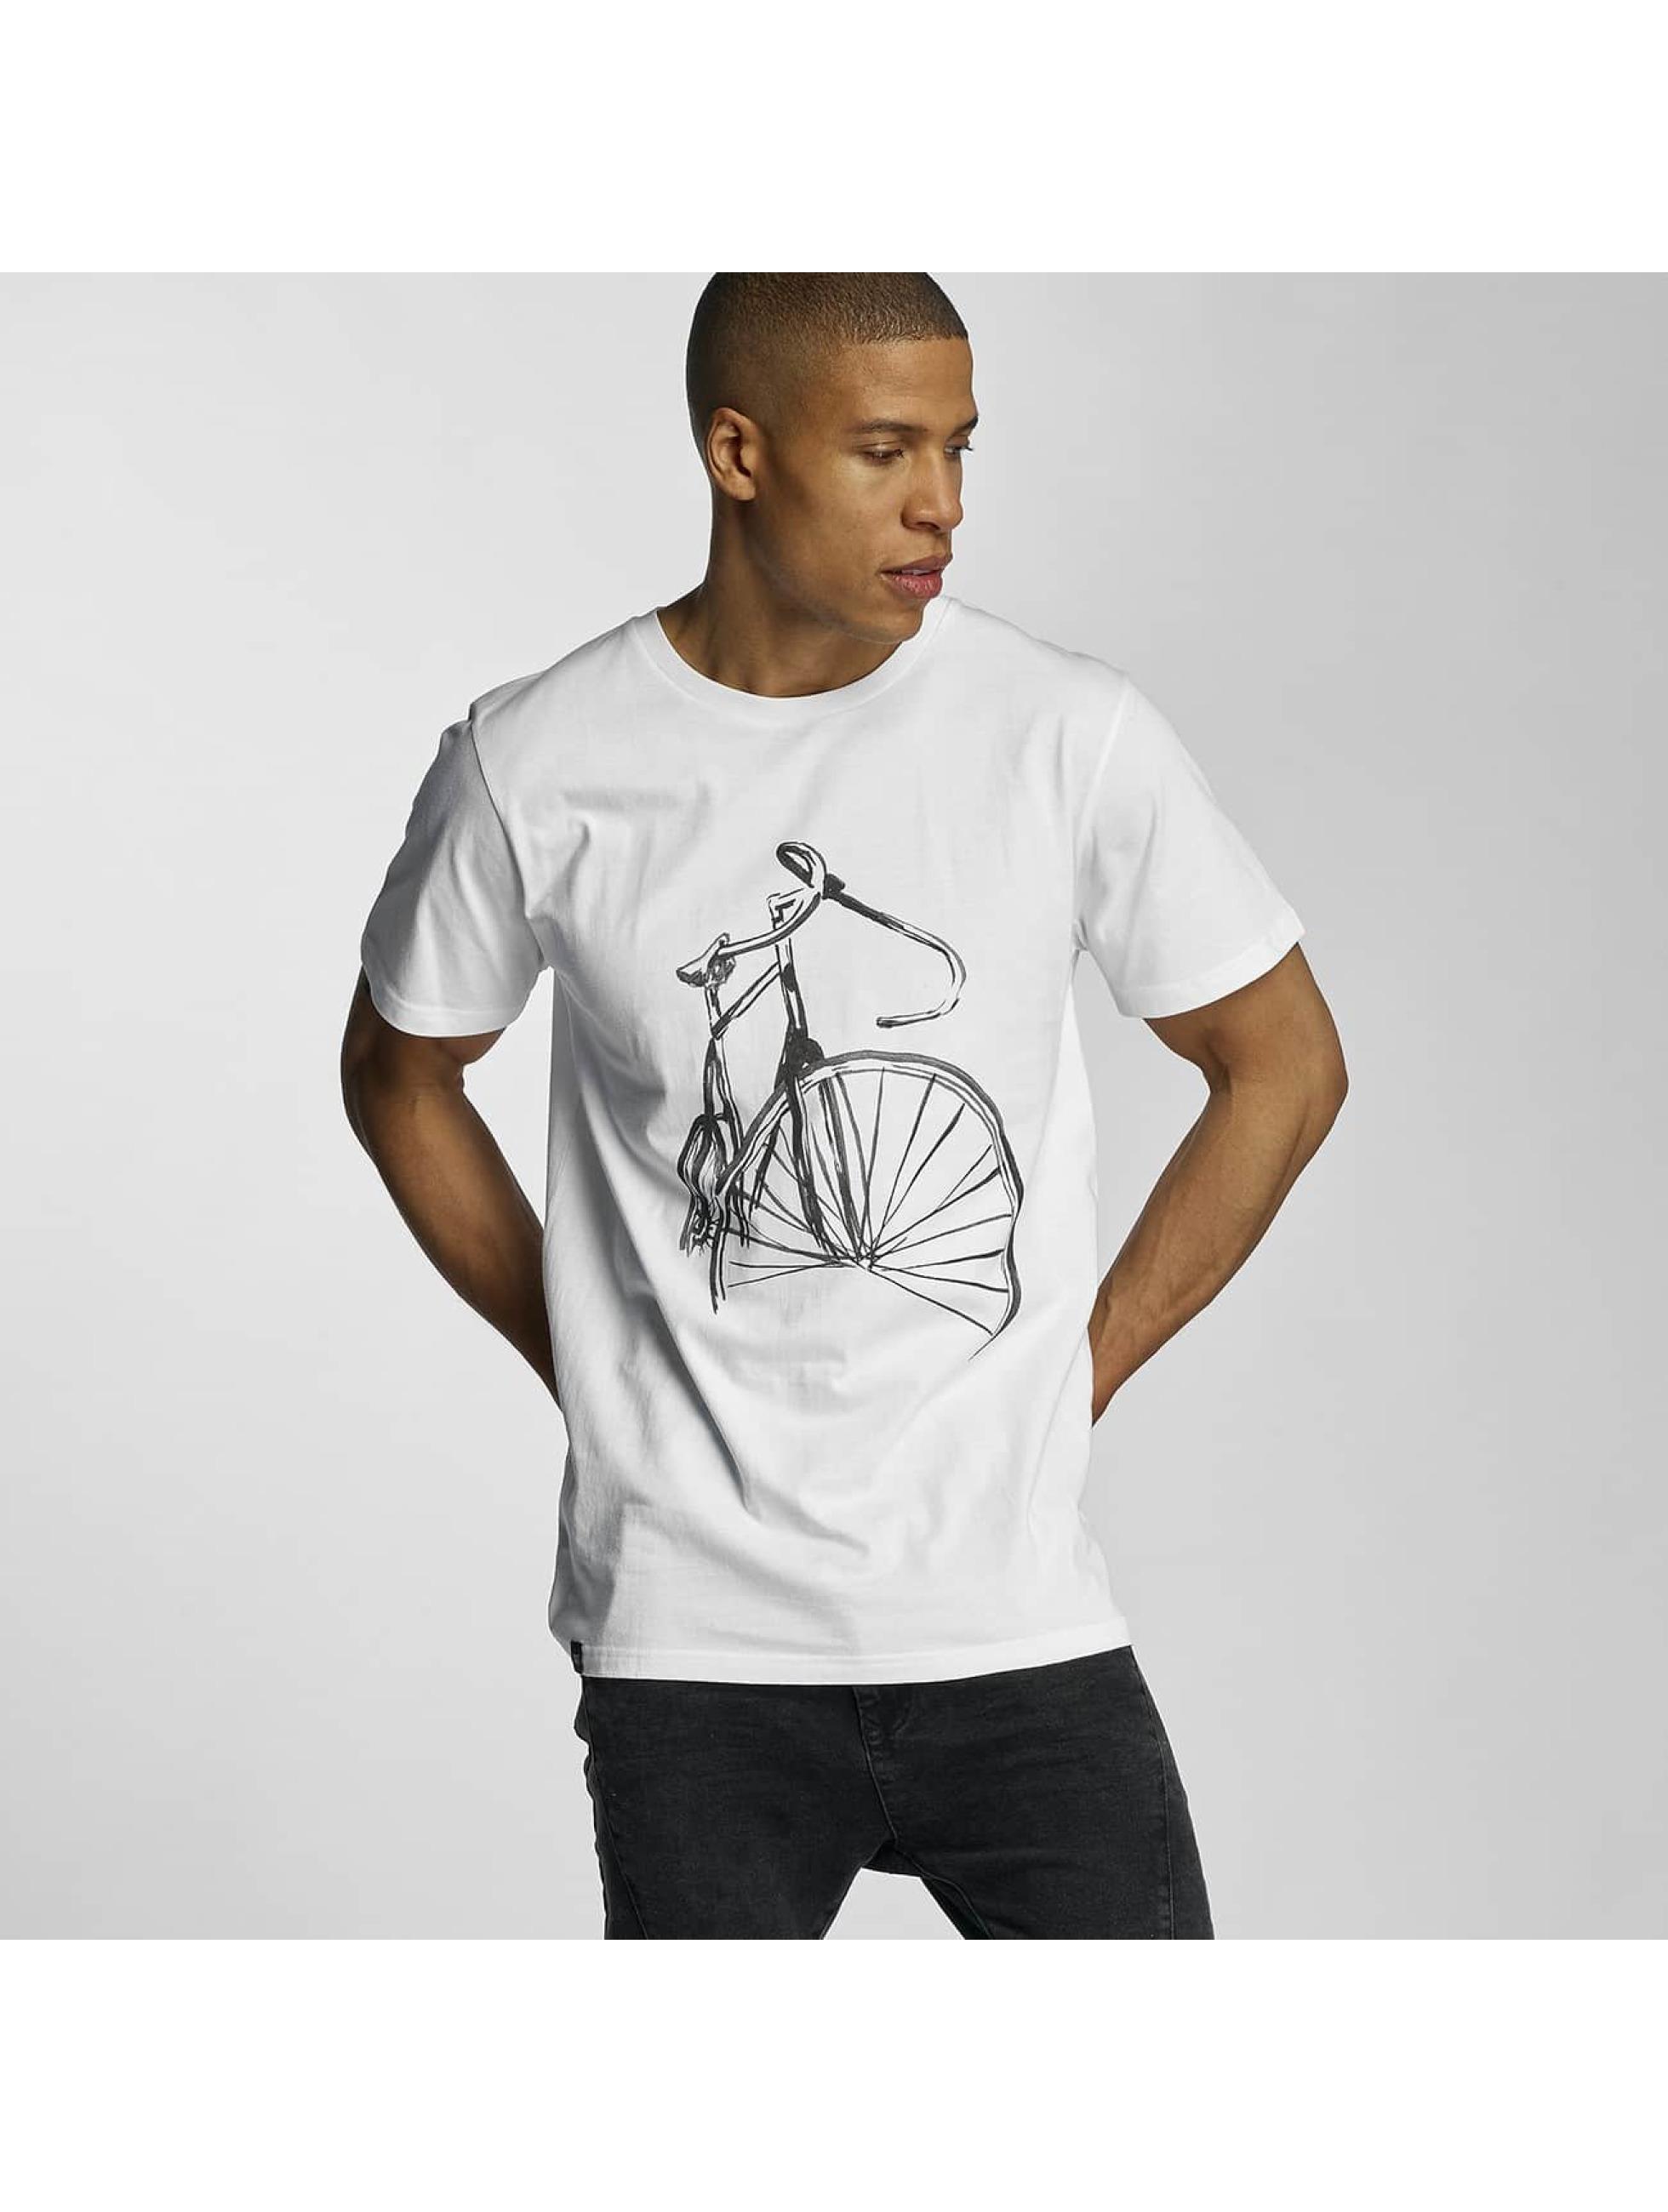 DEDICATED Tričká Sketch Bike biela